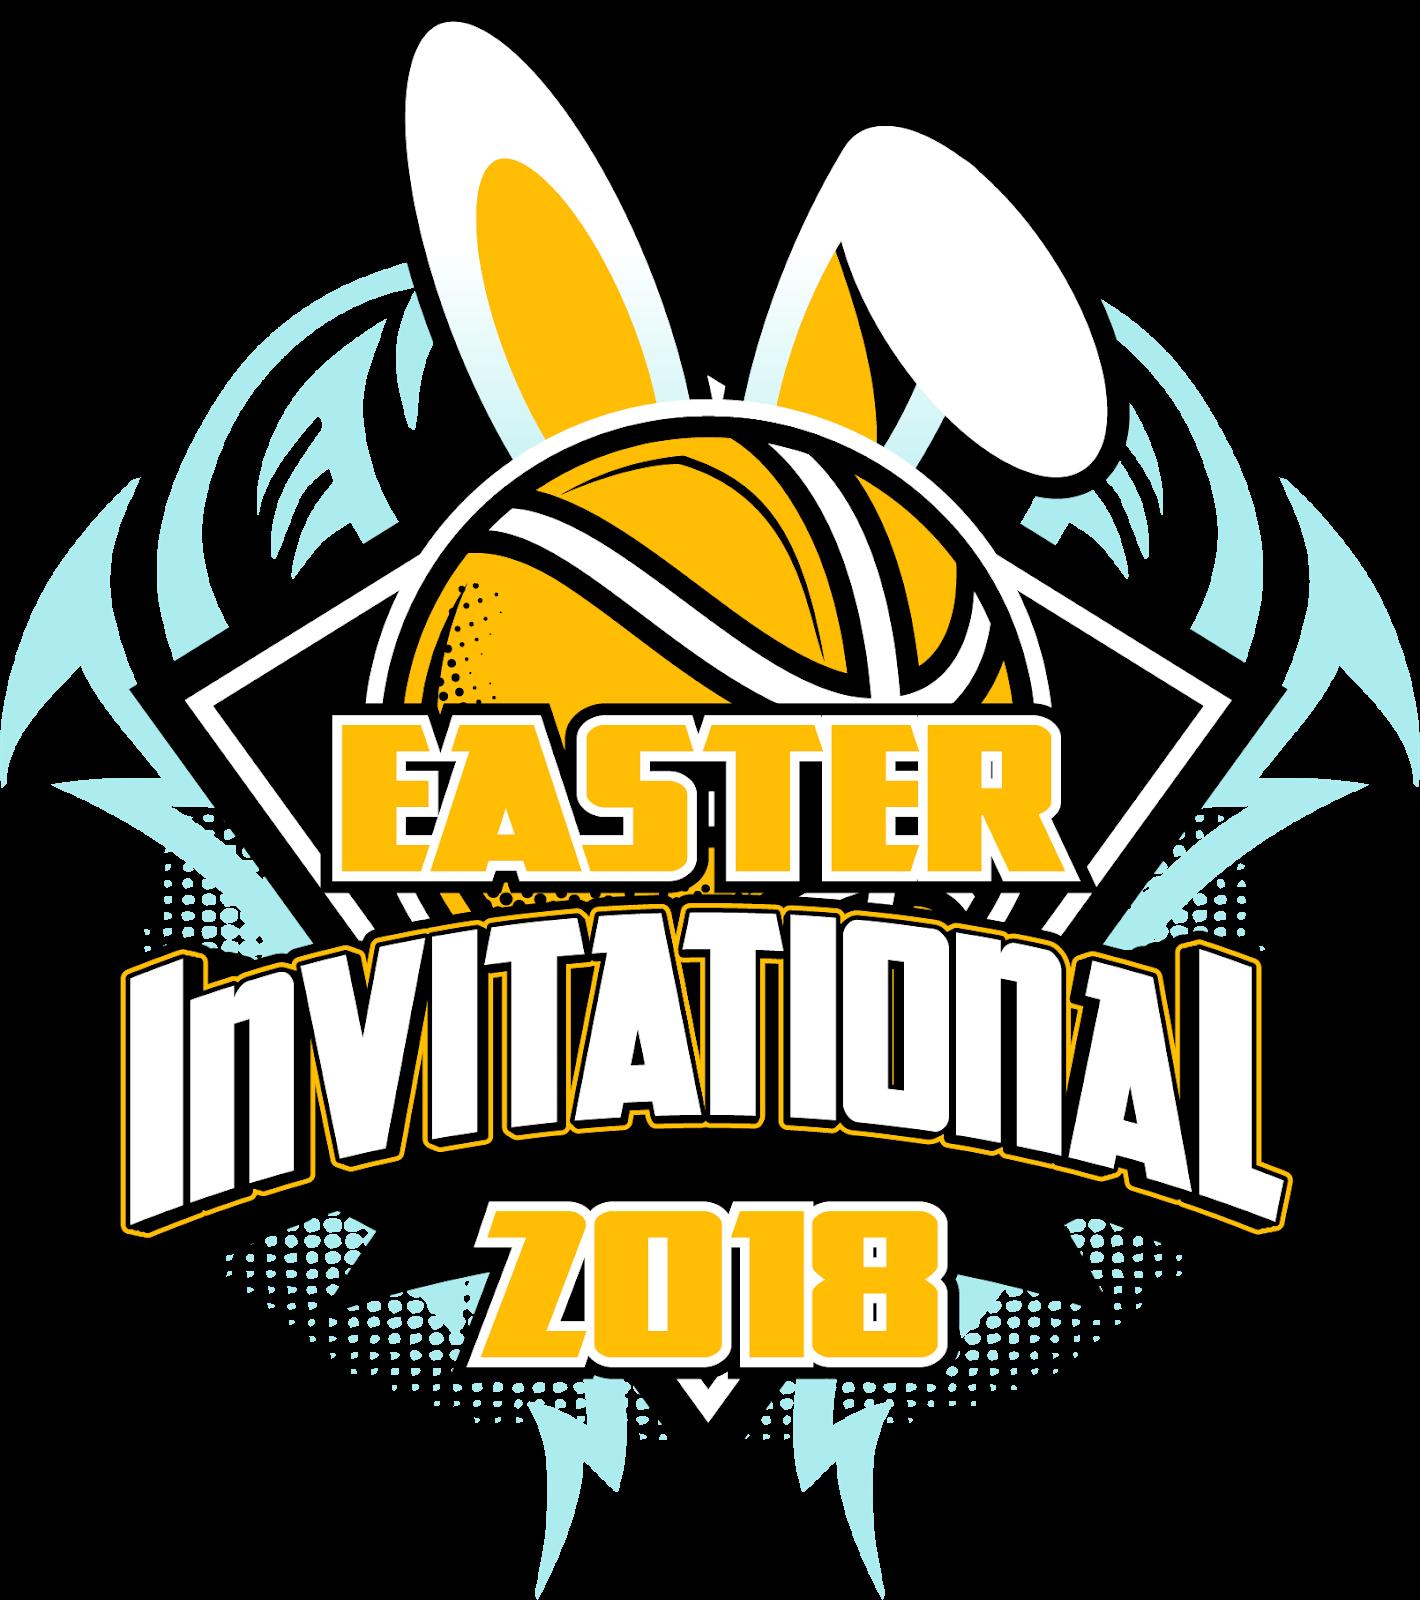 FREE LOGO DOWNLOAD EASTER INVITATIONAL BASKETBALL 2018